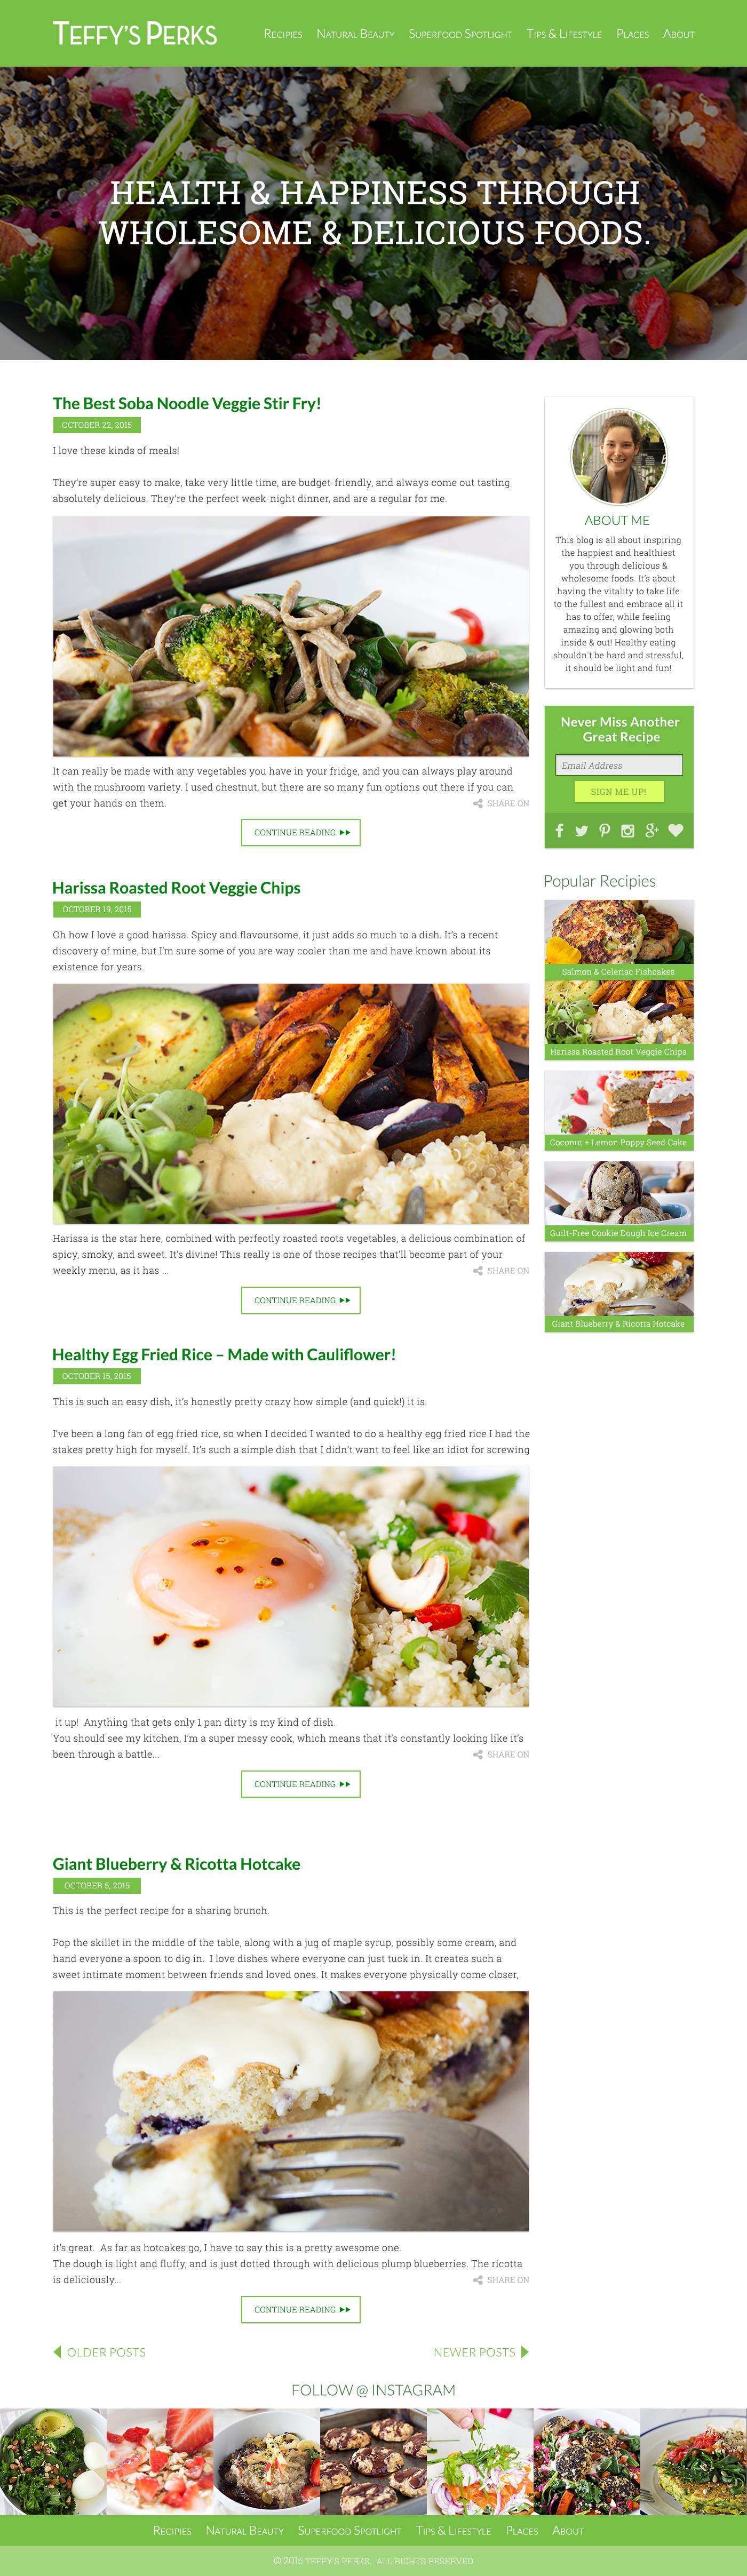 Teffy's Perks Homepage Design